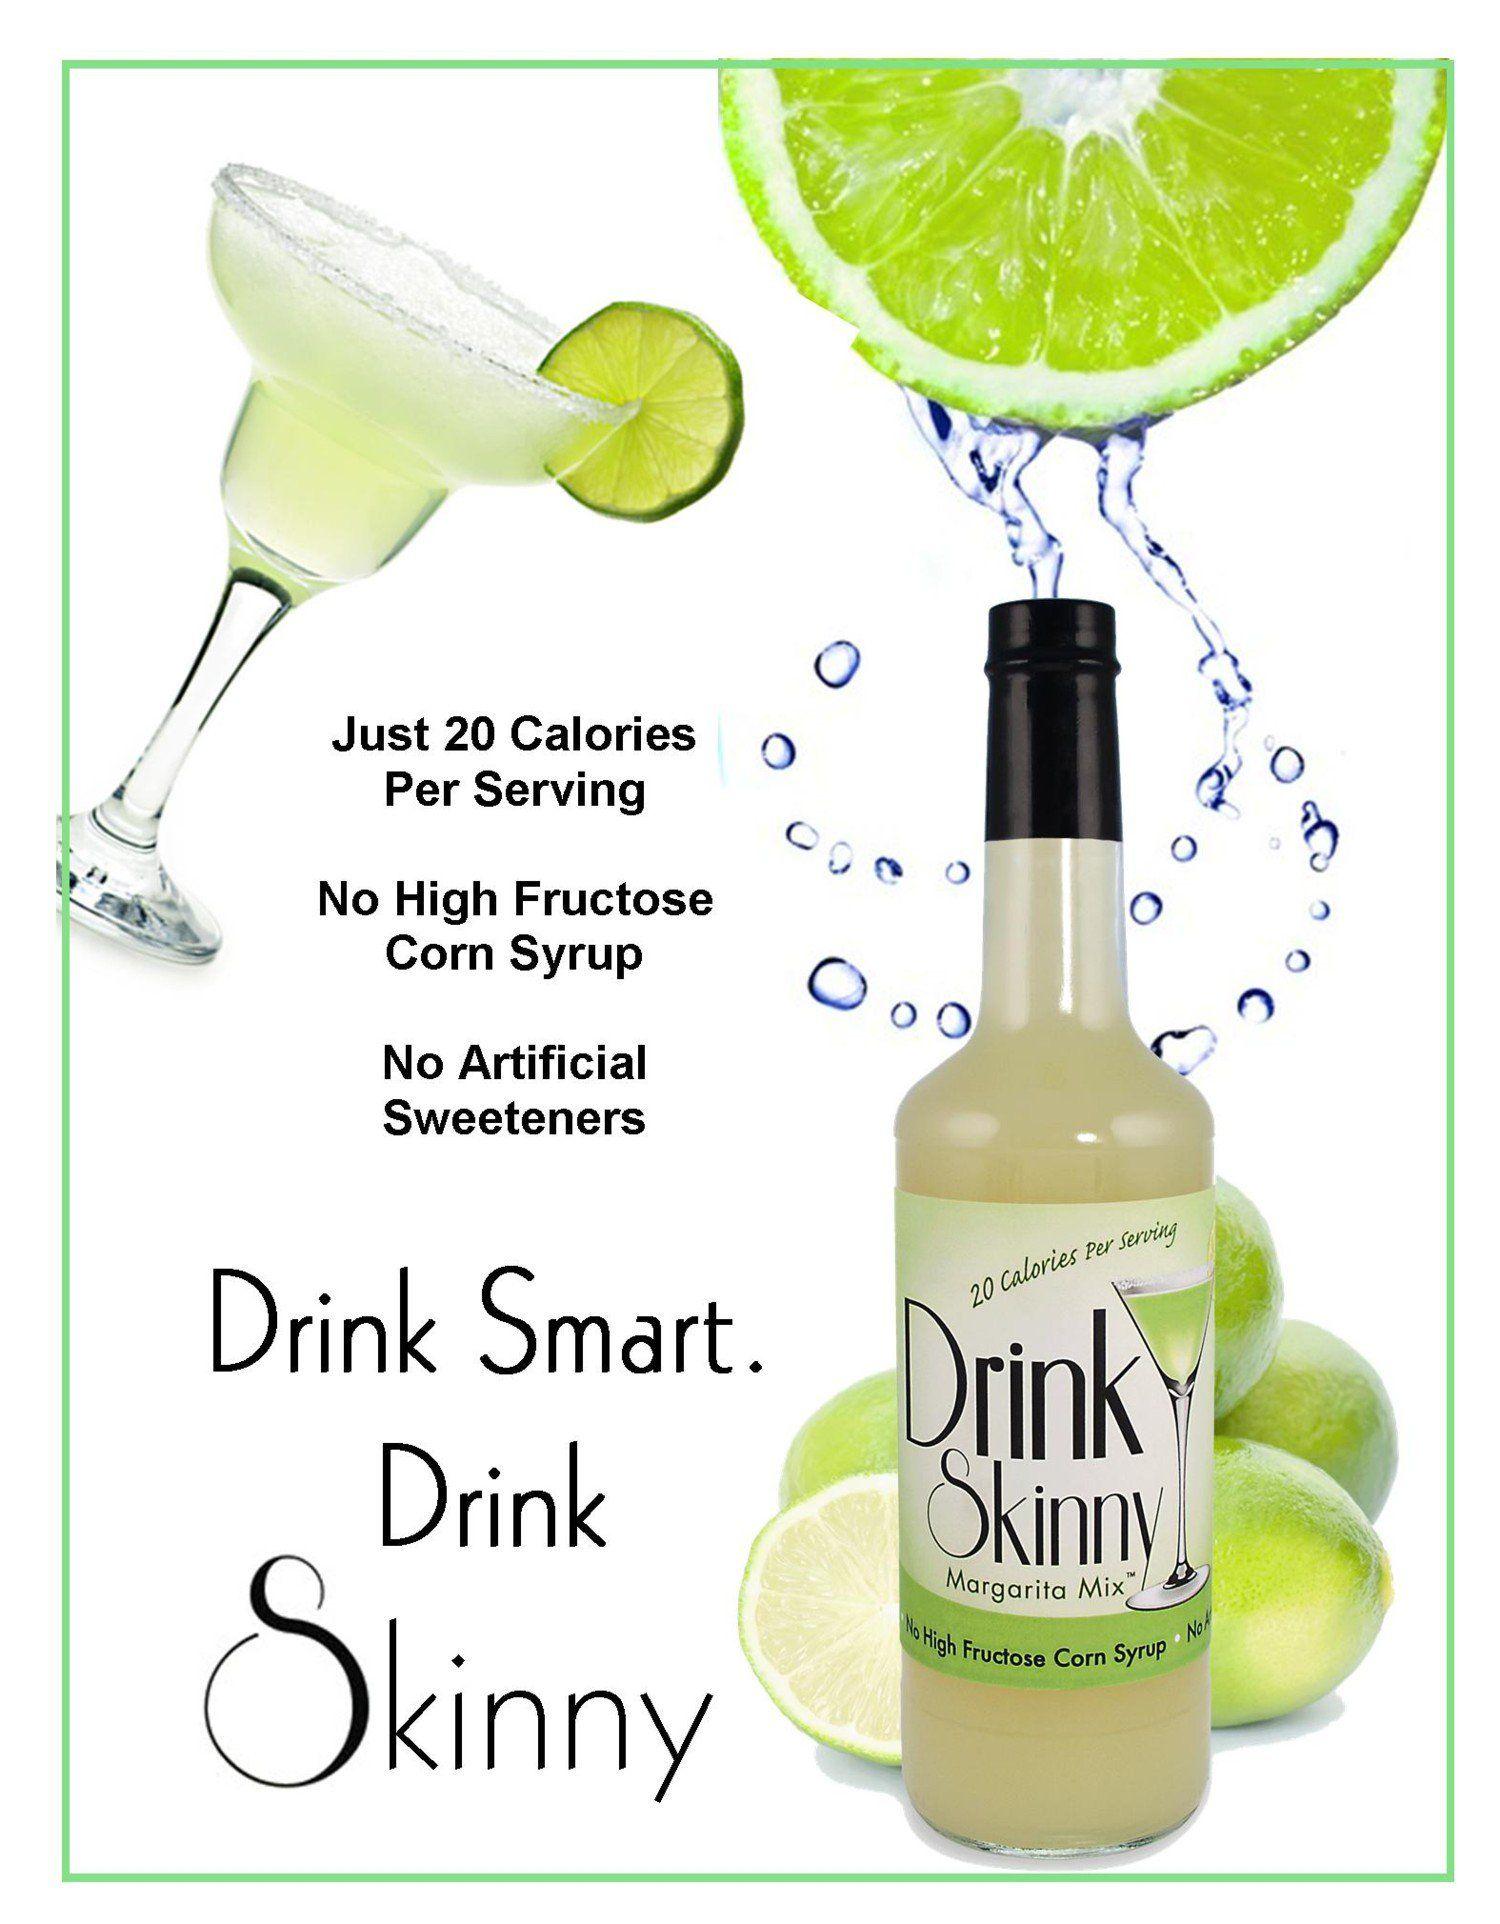 Drink Skinny ad